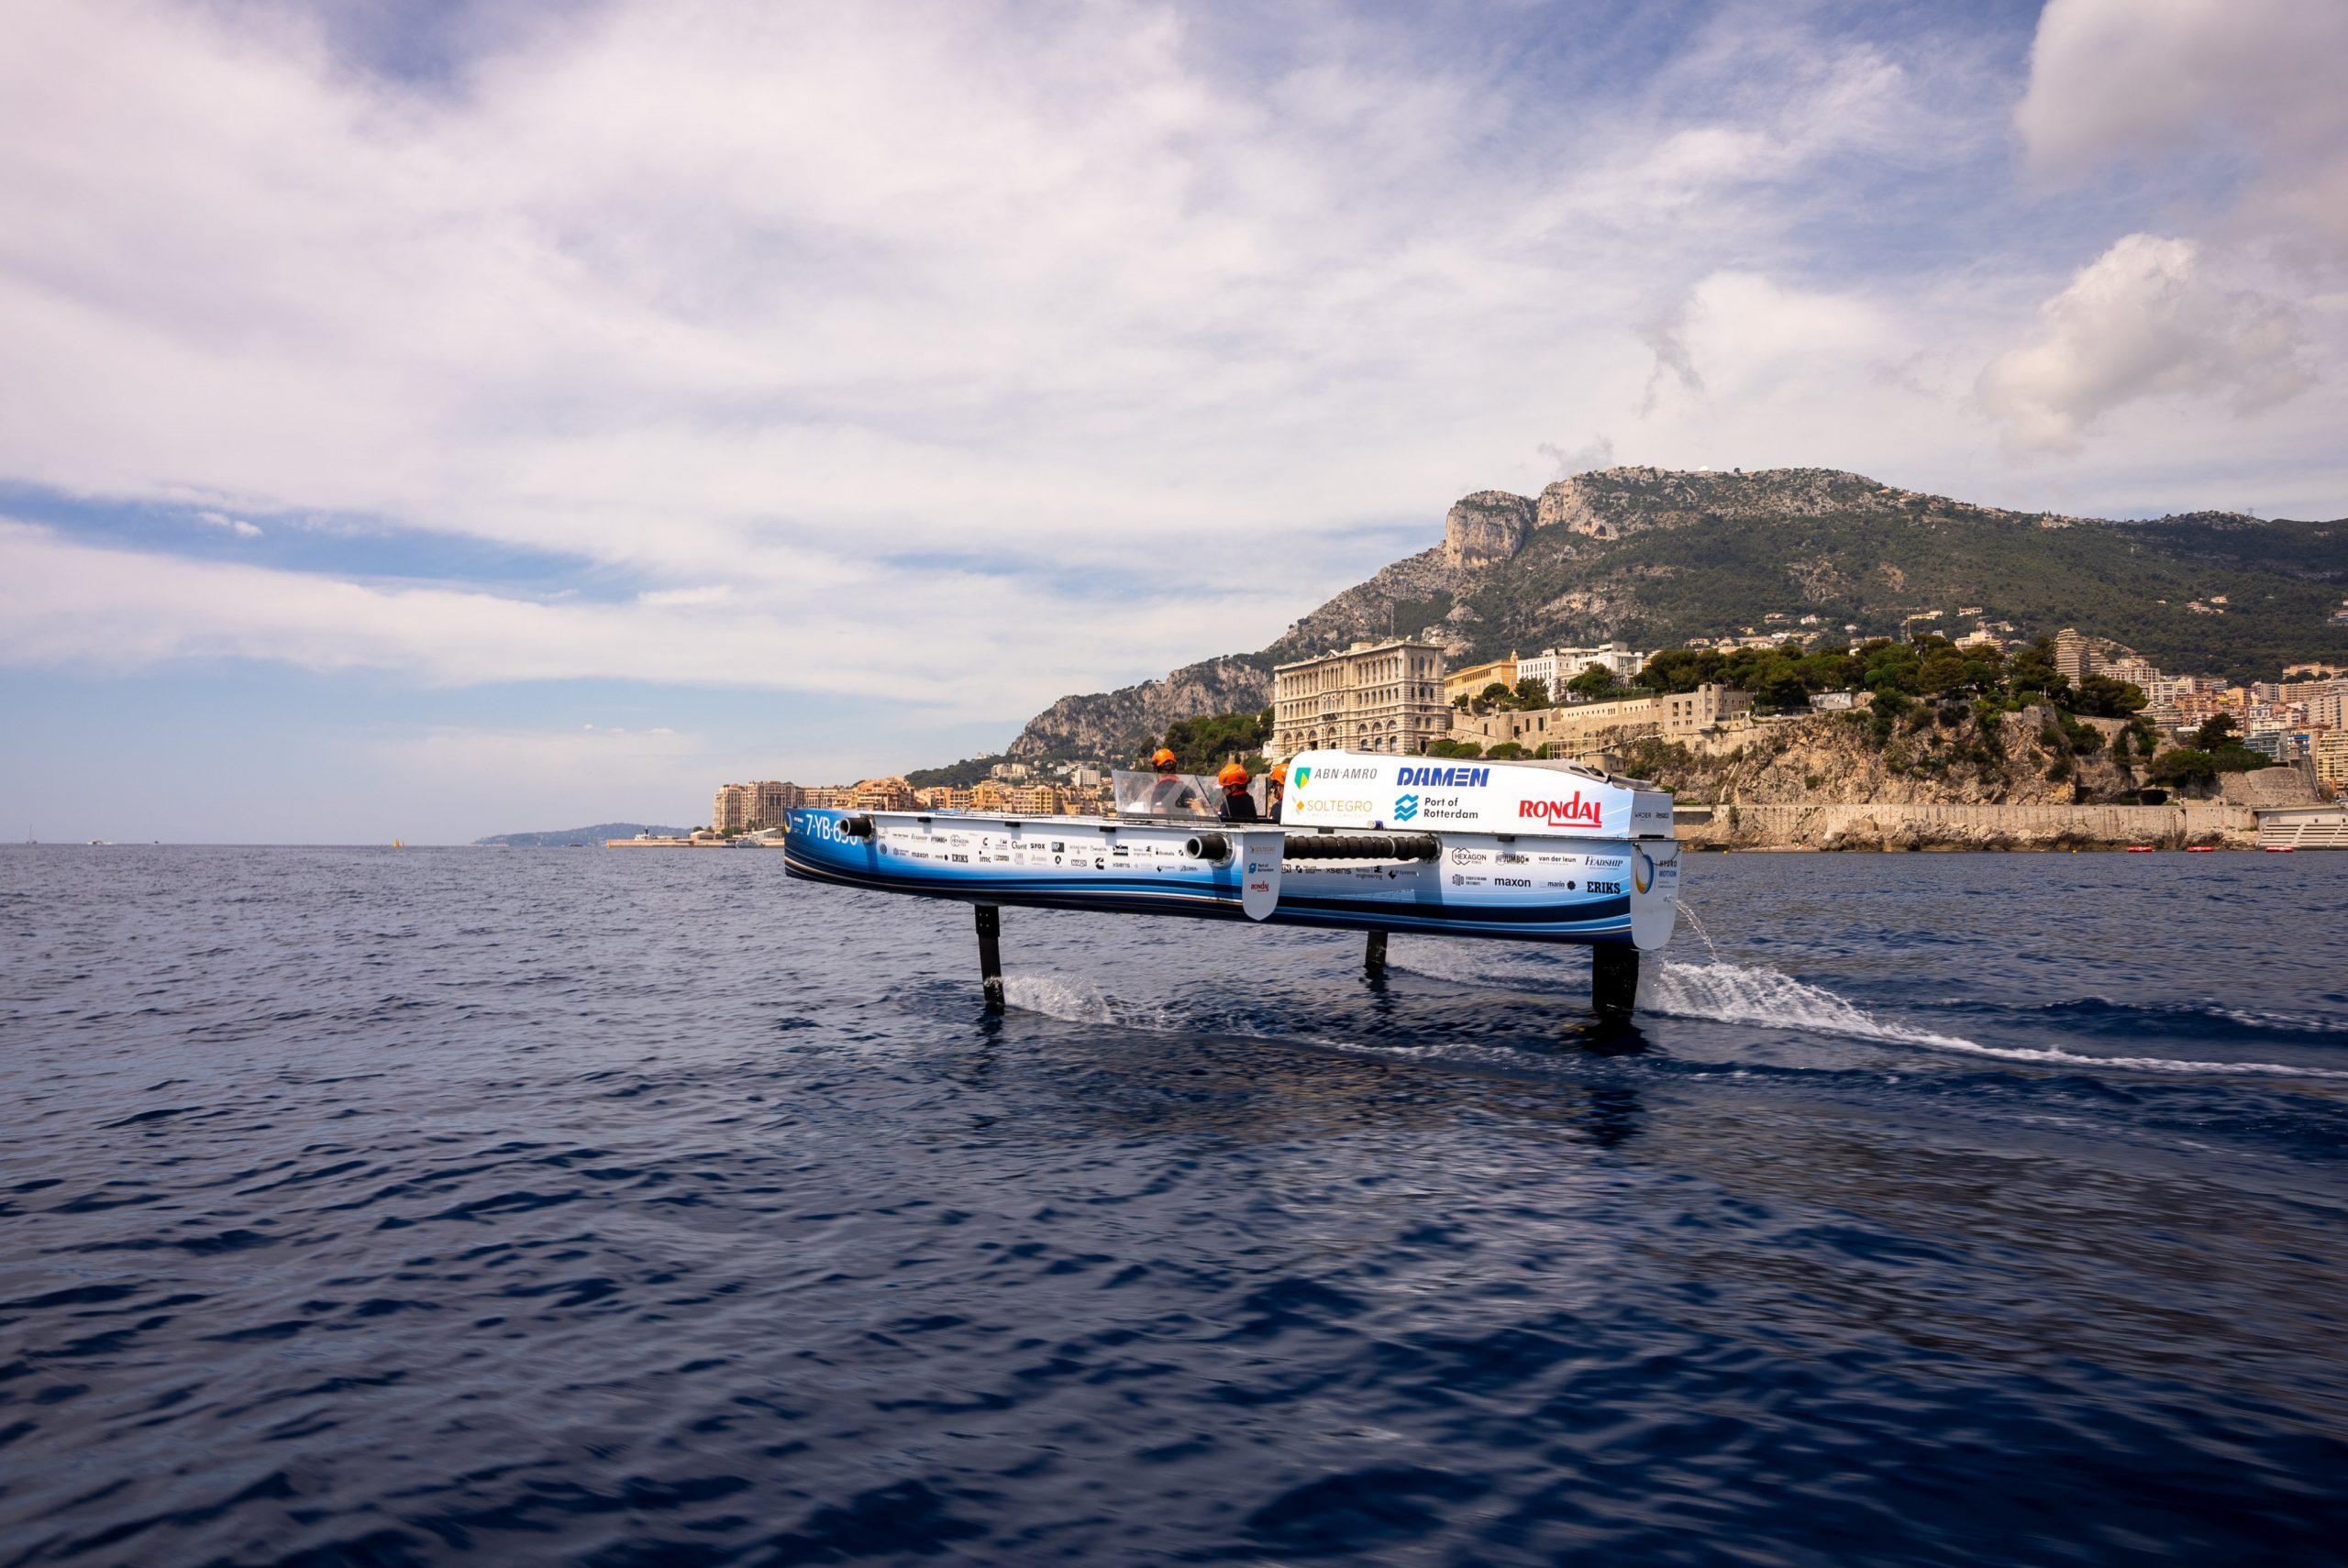 Damage prevents TU Delft's hydrogen boat from sailing final race in Monaco